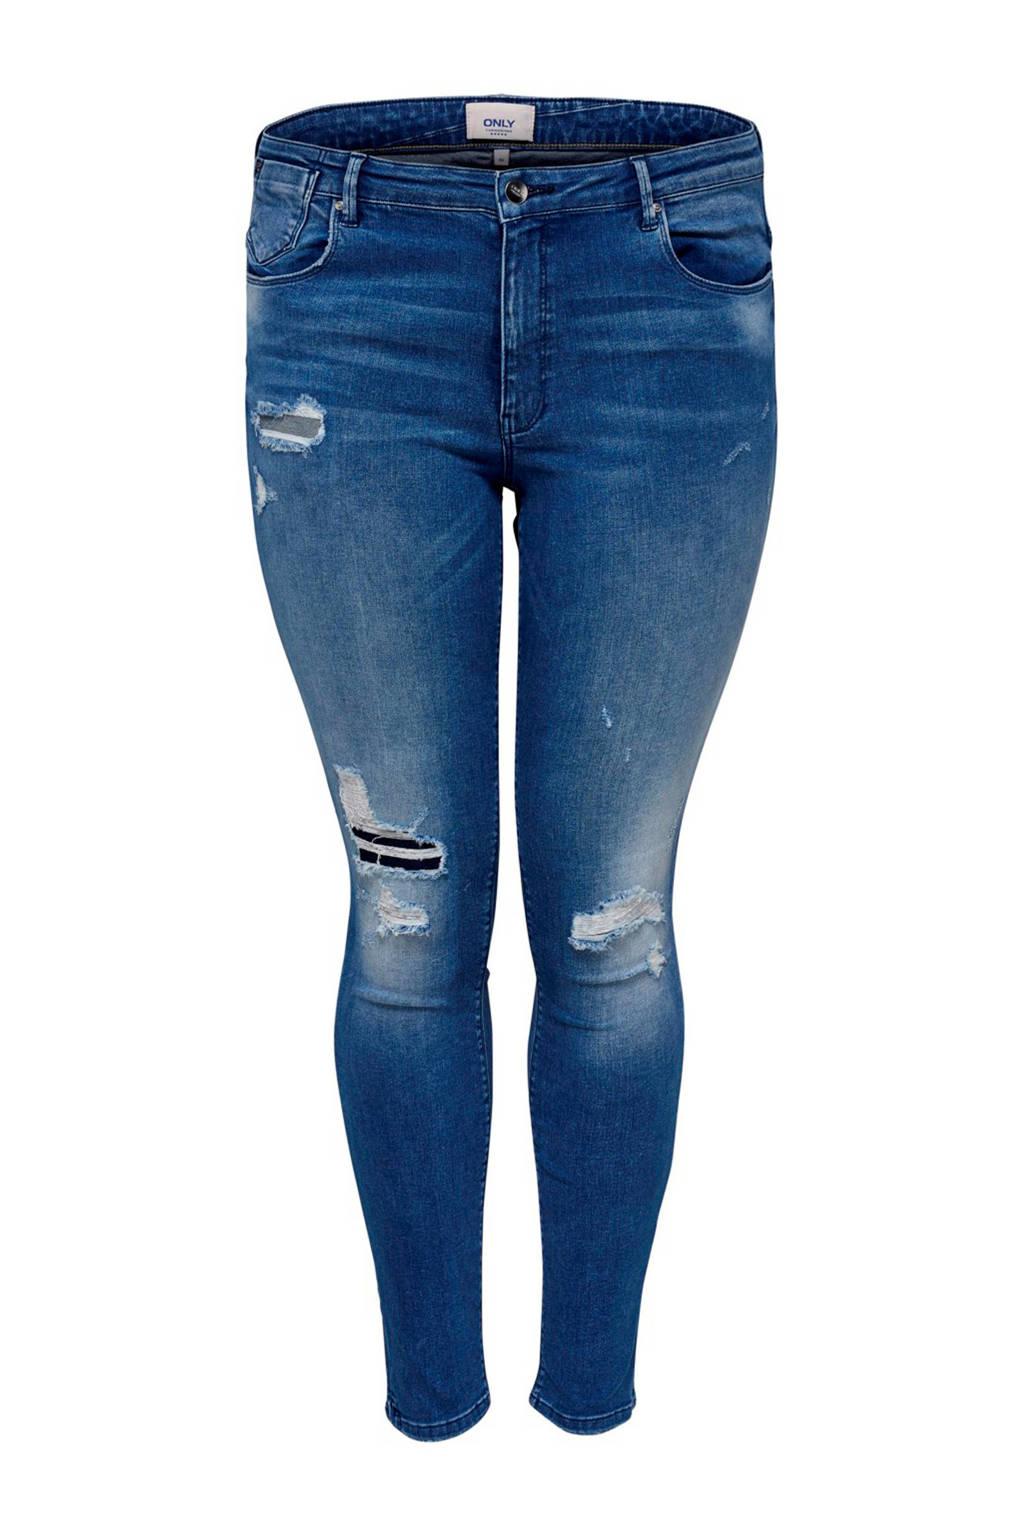 ONLY carmakoma curvy jack regular skinny jeans, Blauw